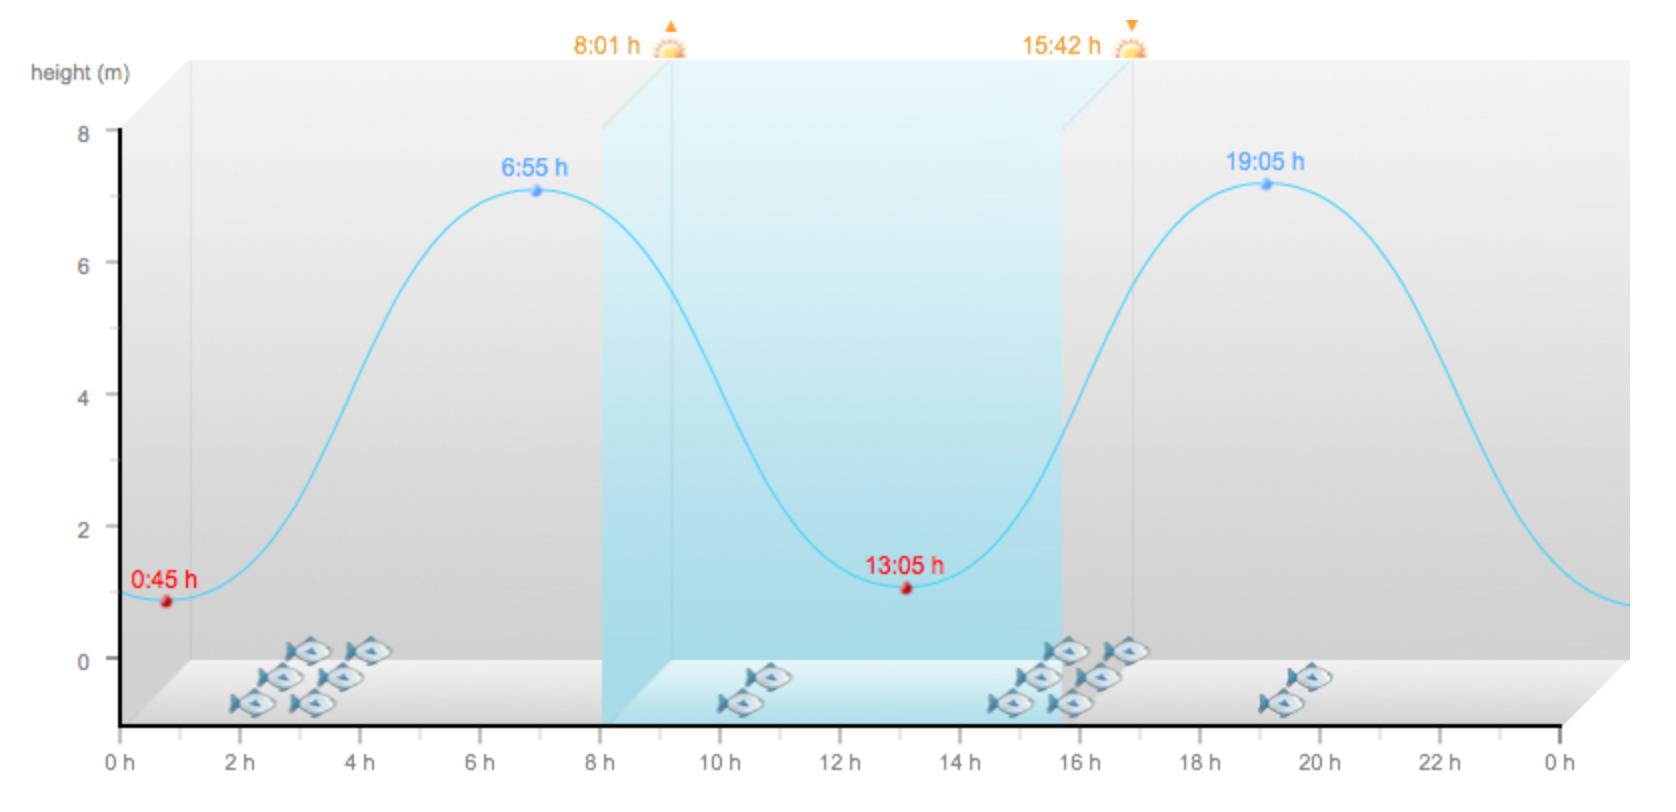 Tidal surge graph spurn 2013